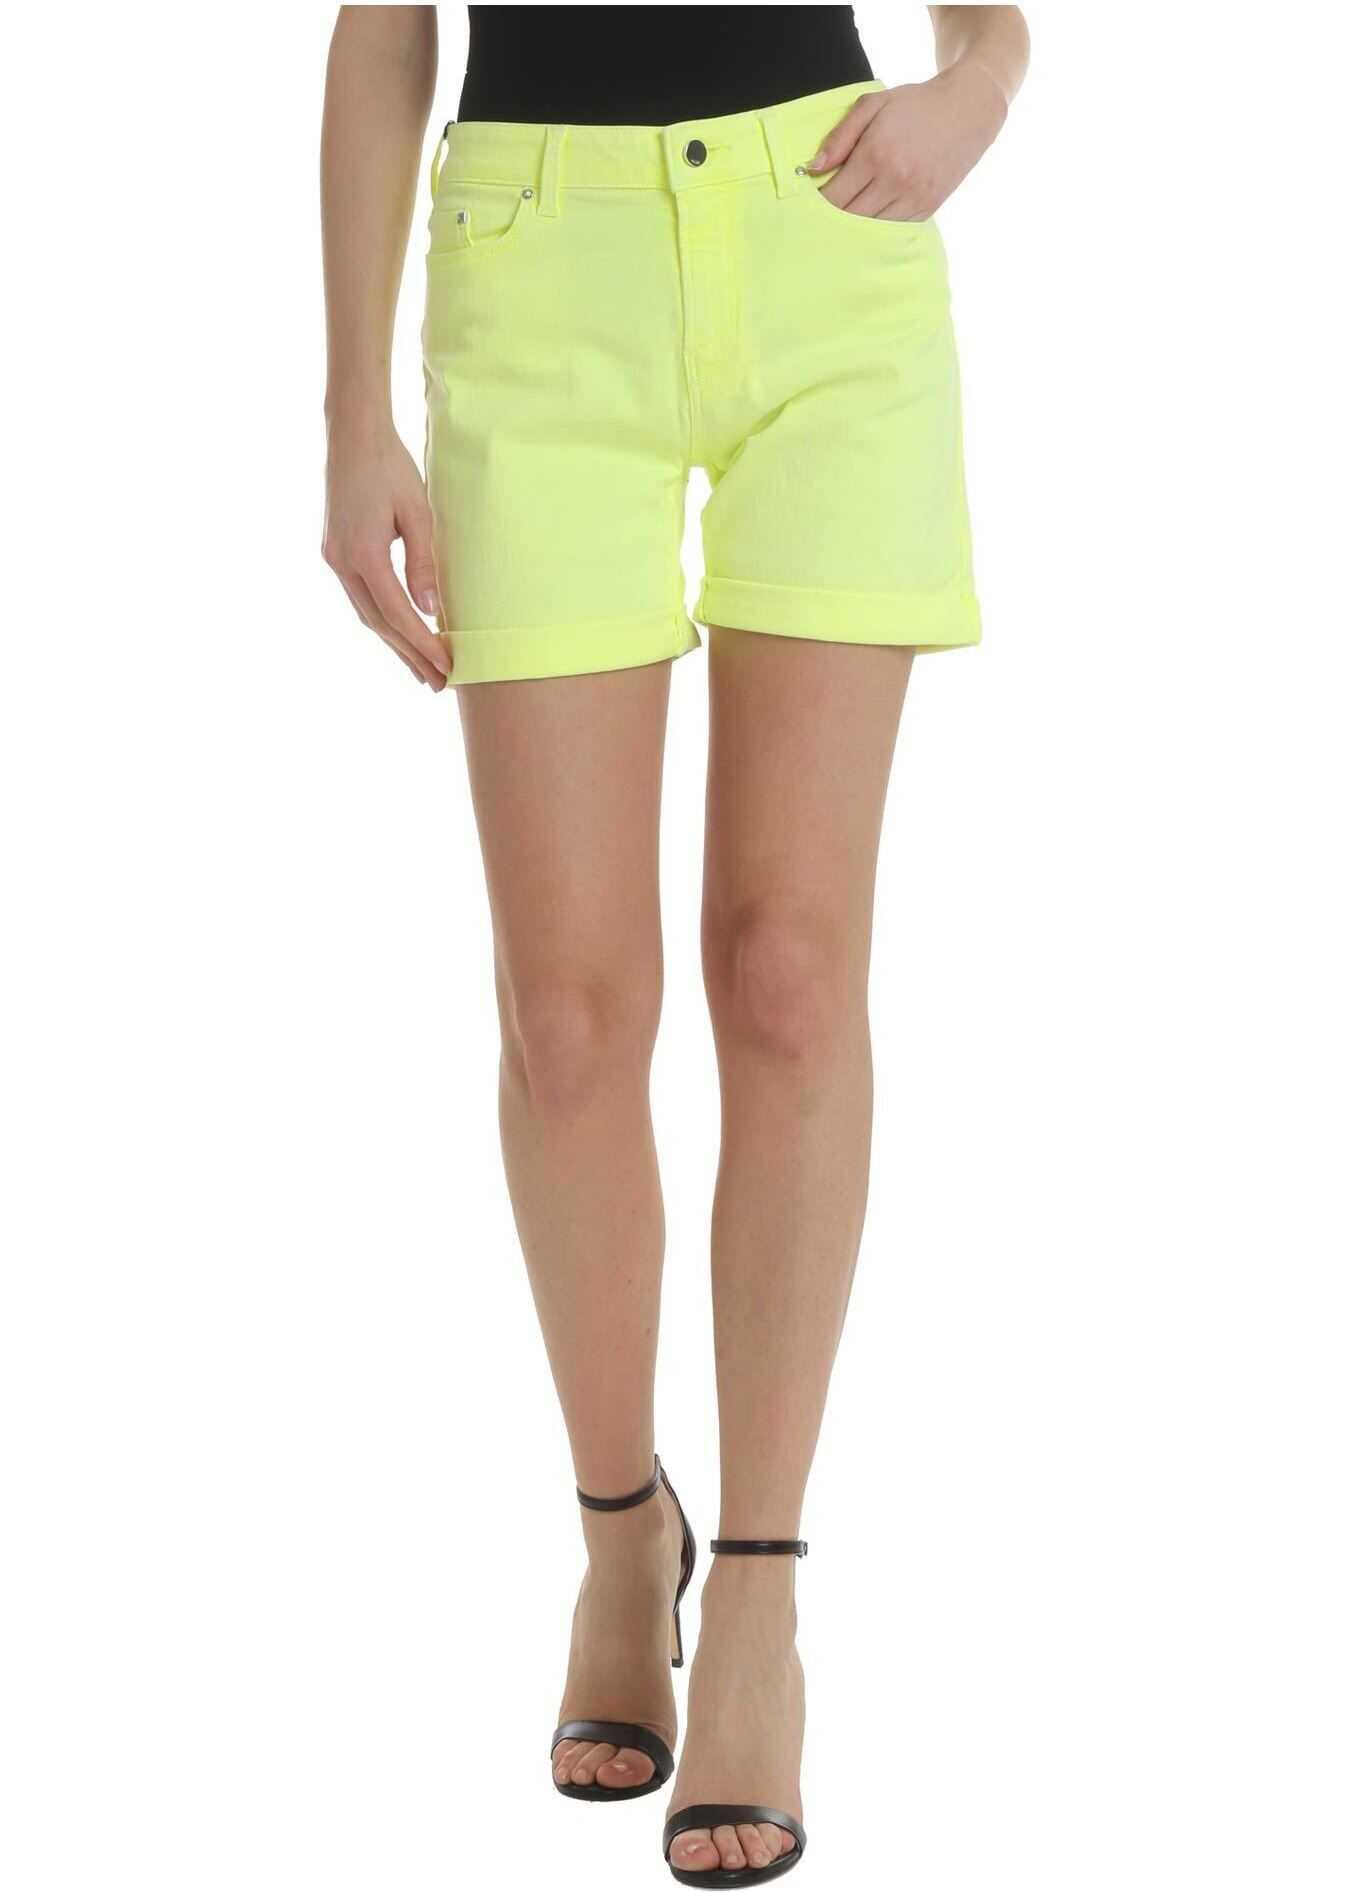 Karl Lagerfeld Neon Yellow Rolled Shorts Yellow